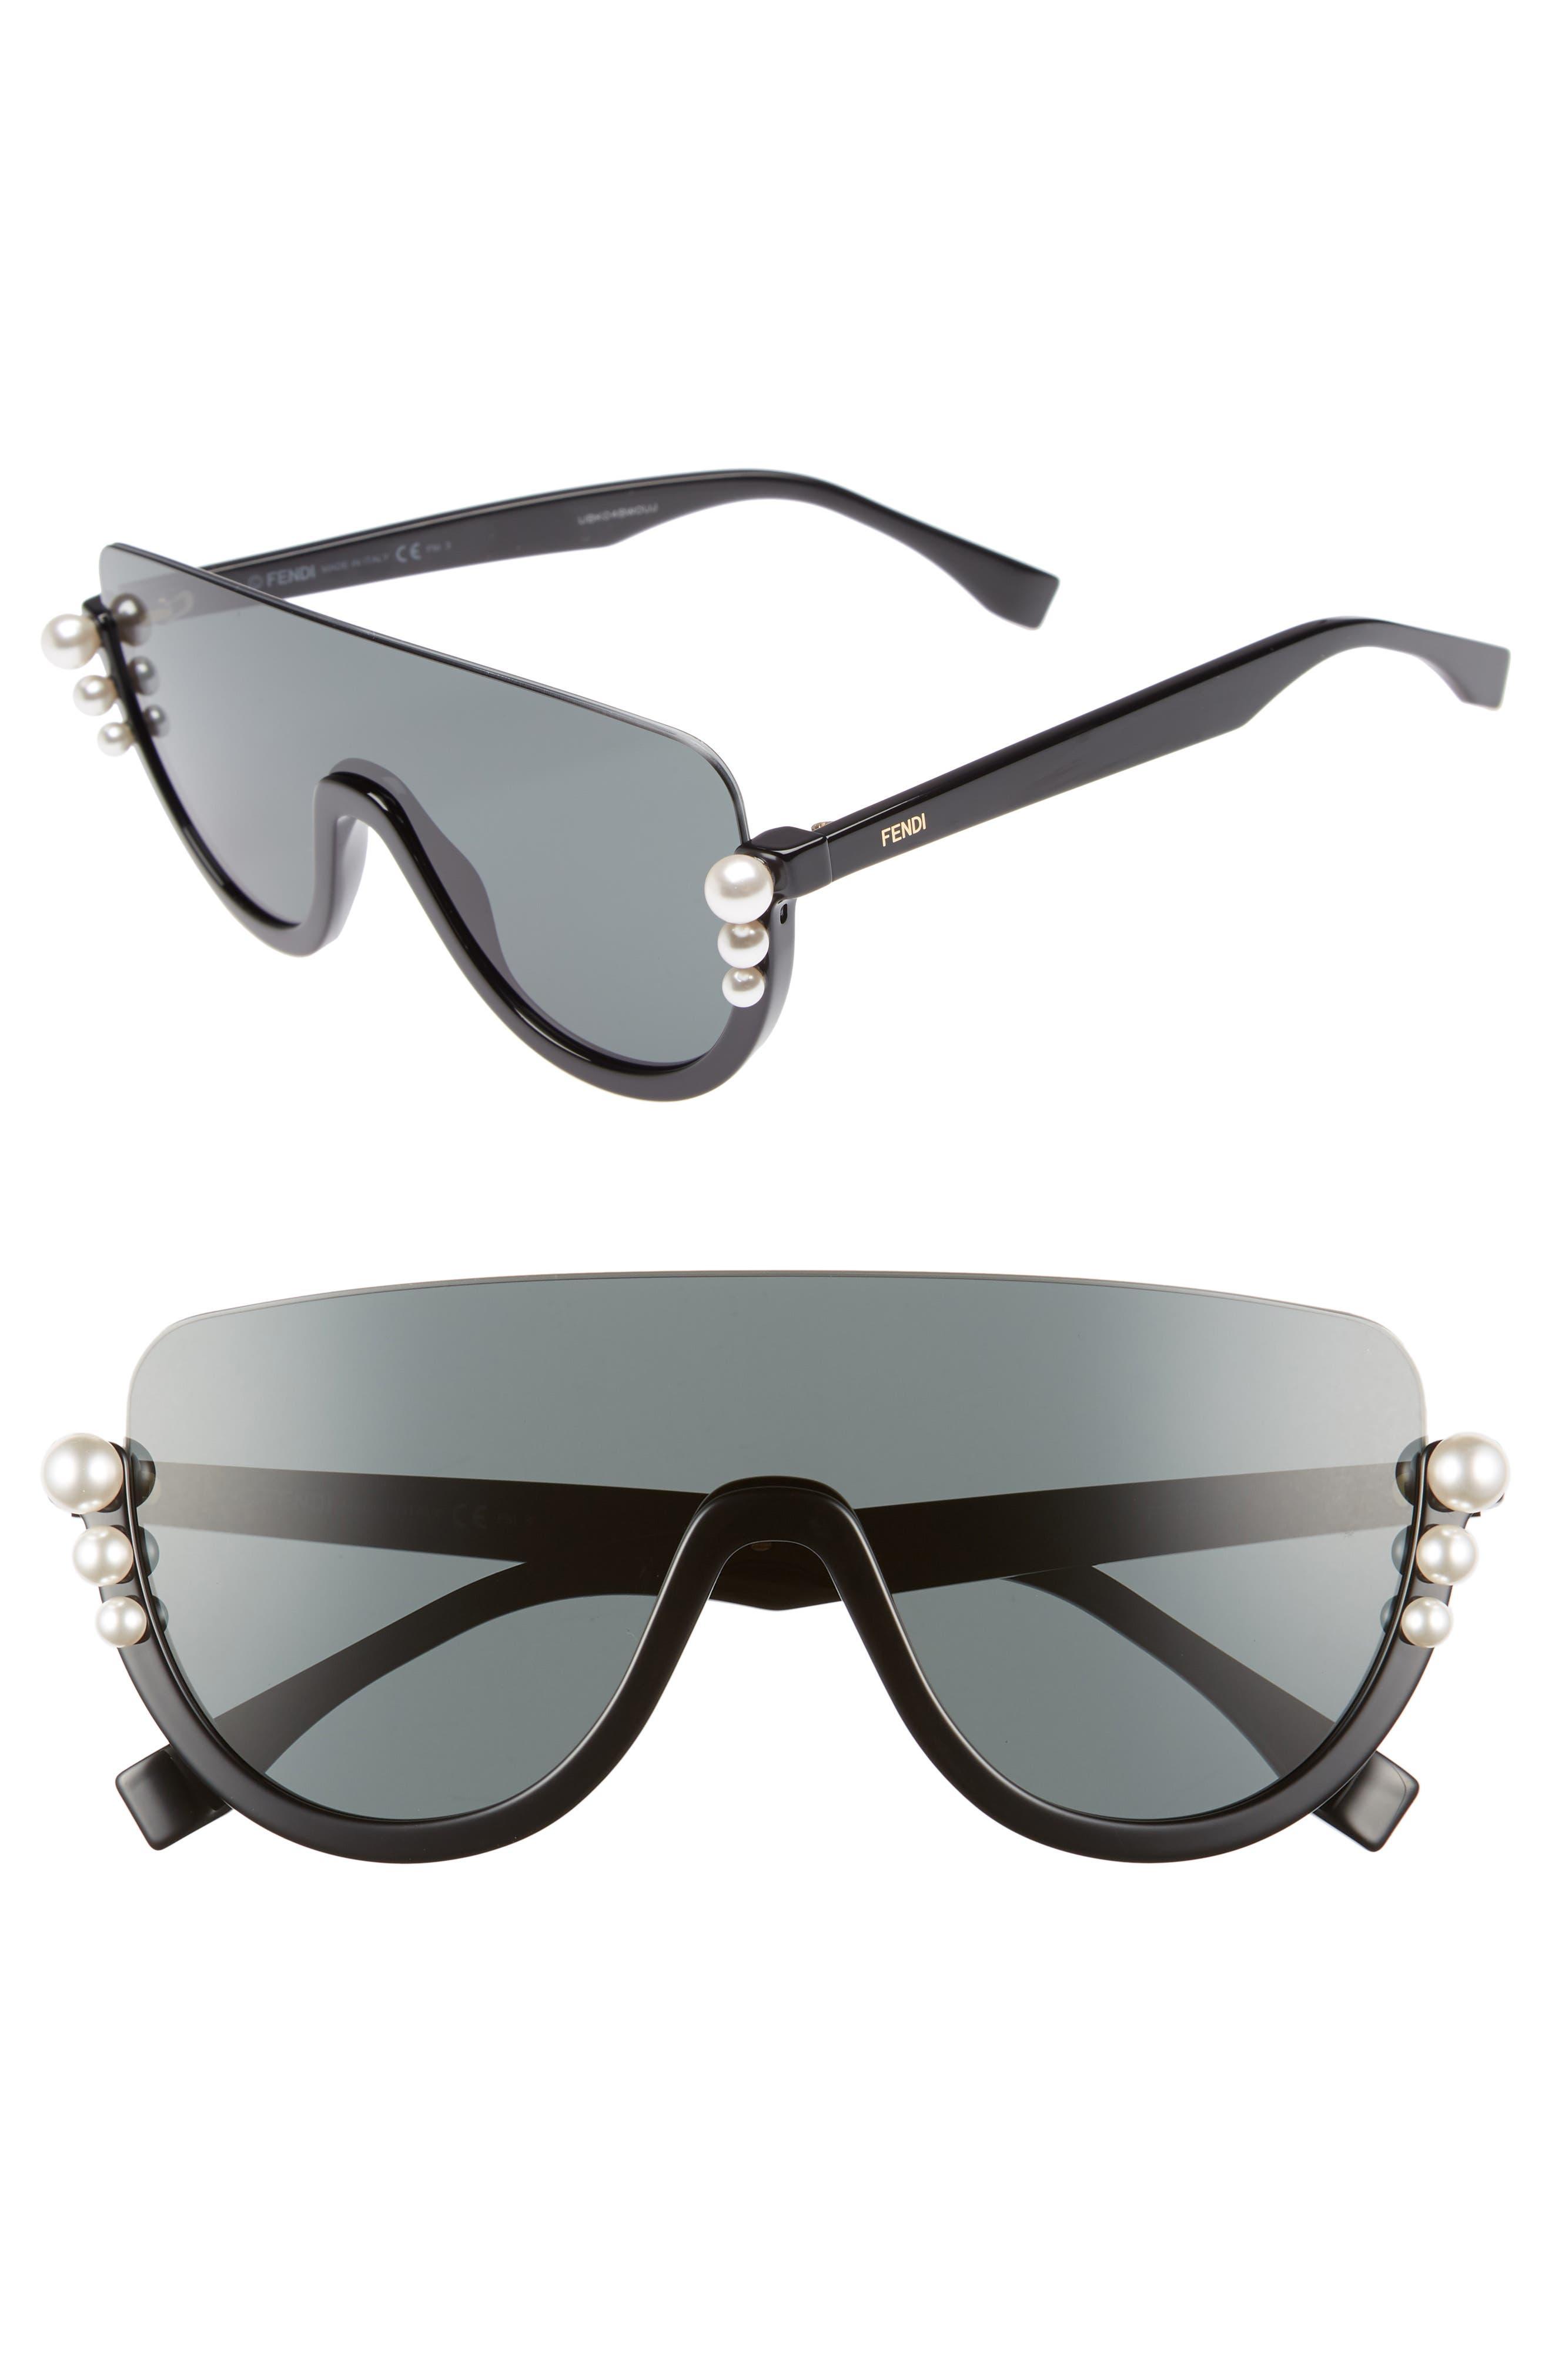 Fendi 57mm Polarized Rimless Shield Sunglasses